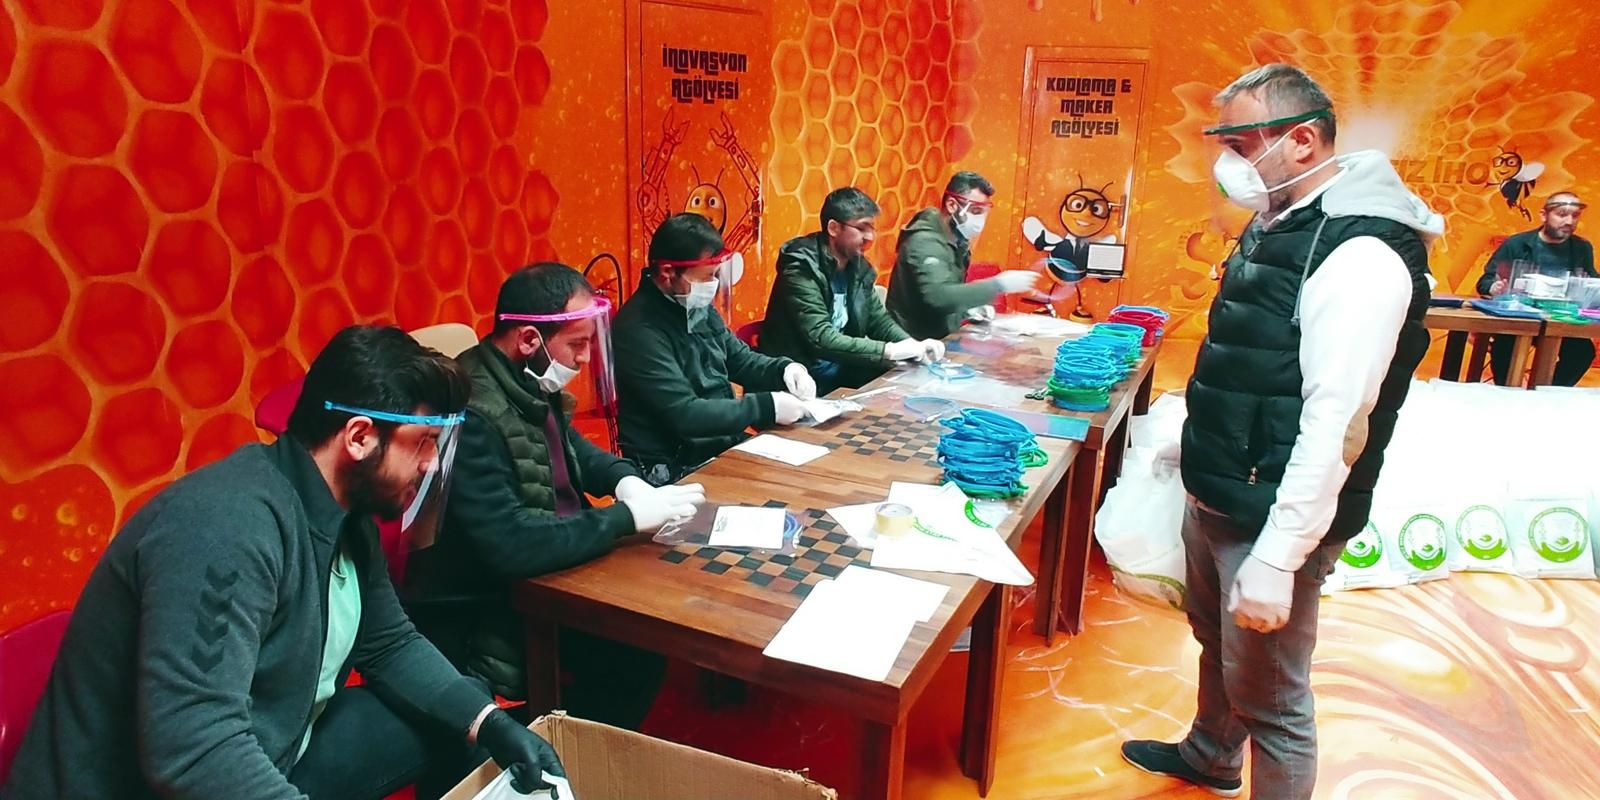 Düzce Mehmet Akif İnan İmam Hatip Ortaokulu (4).jpg